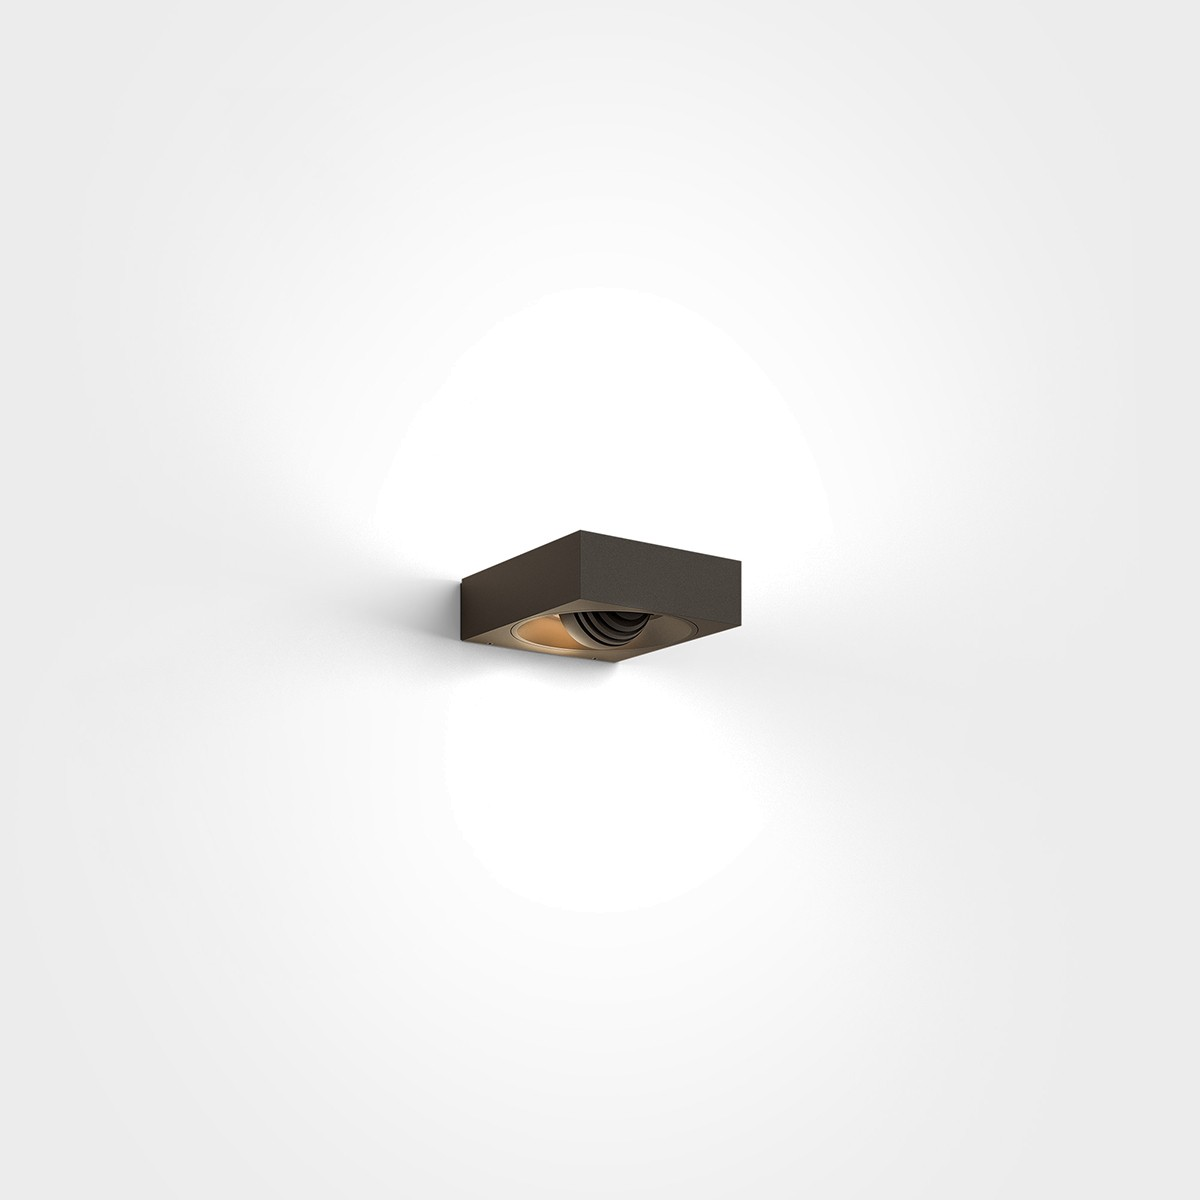 pip au enwandleuchte cool brown braun mobil saege werk bickenbach. Black Bedroom Furniture Sets. Home Design Ideas